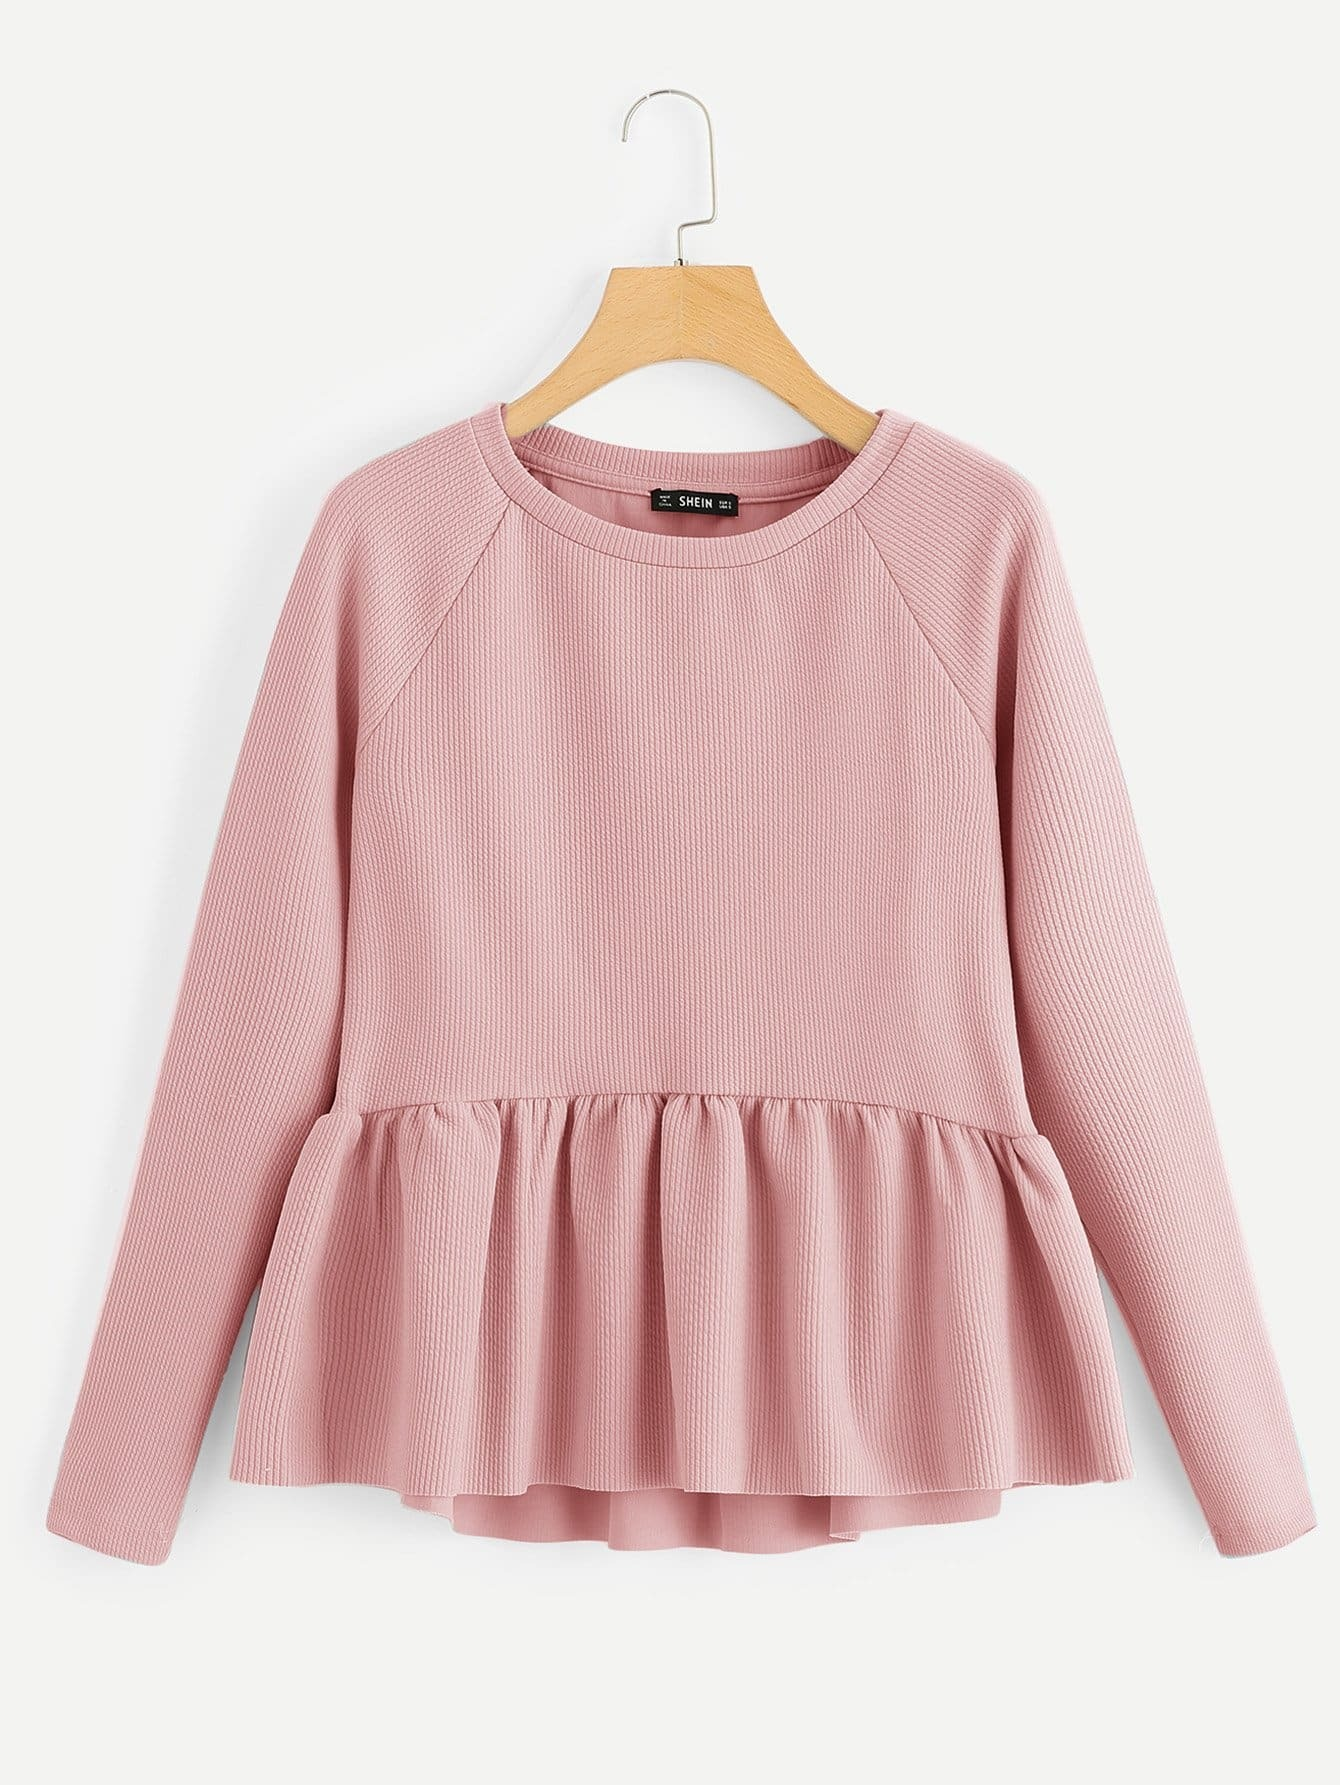 fcad1bed95e1a8 Raglan Sleeve Textured High Low Smock Sweatshirt | MakeMeChic.COM